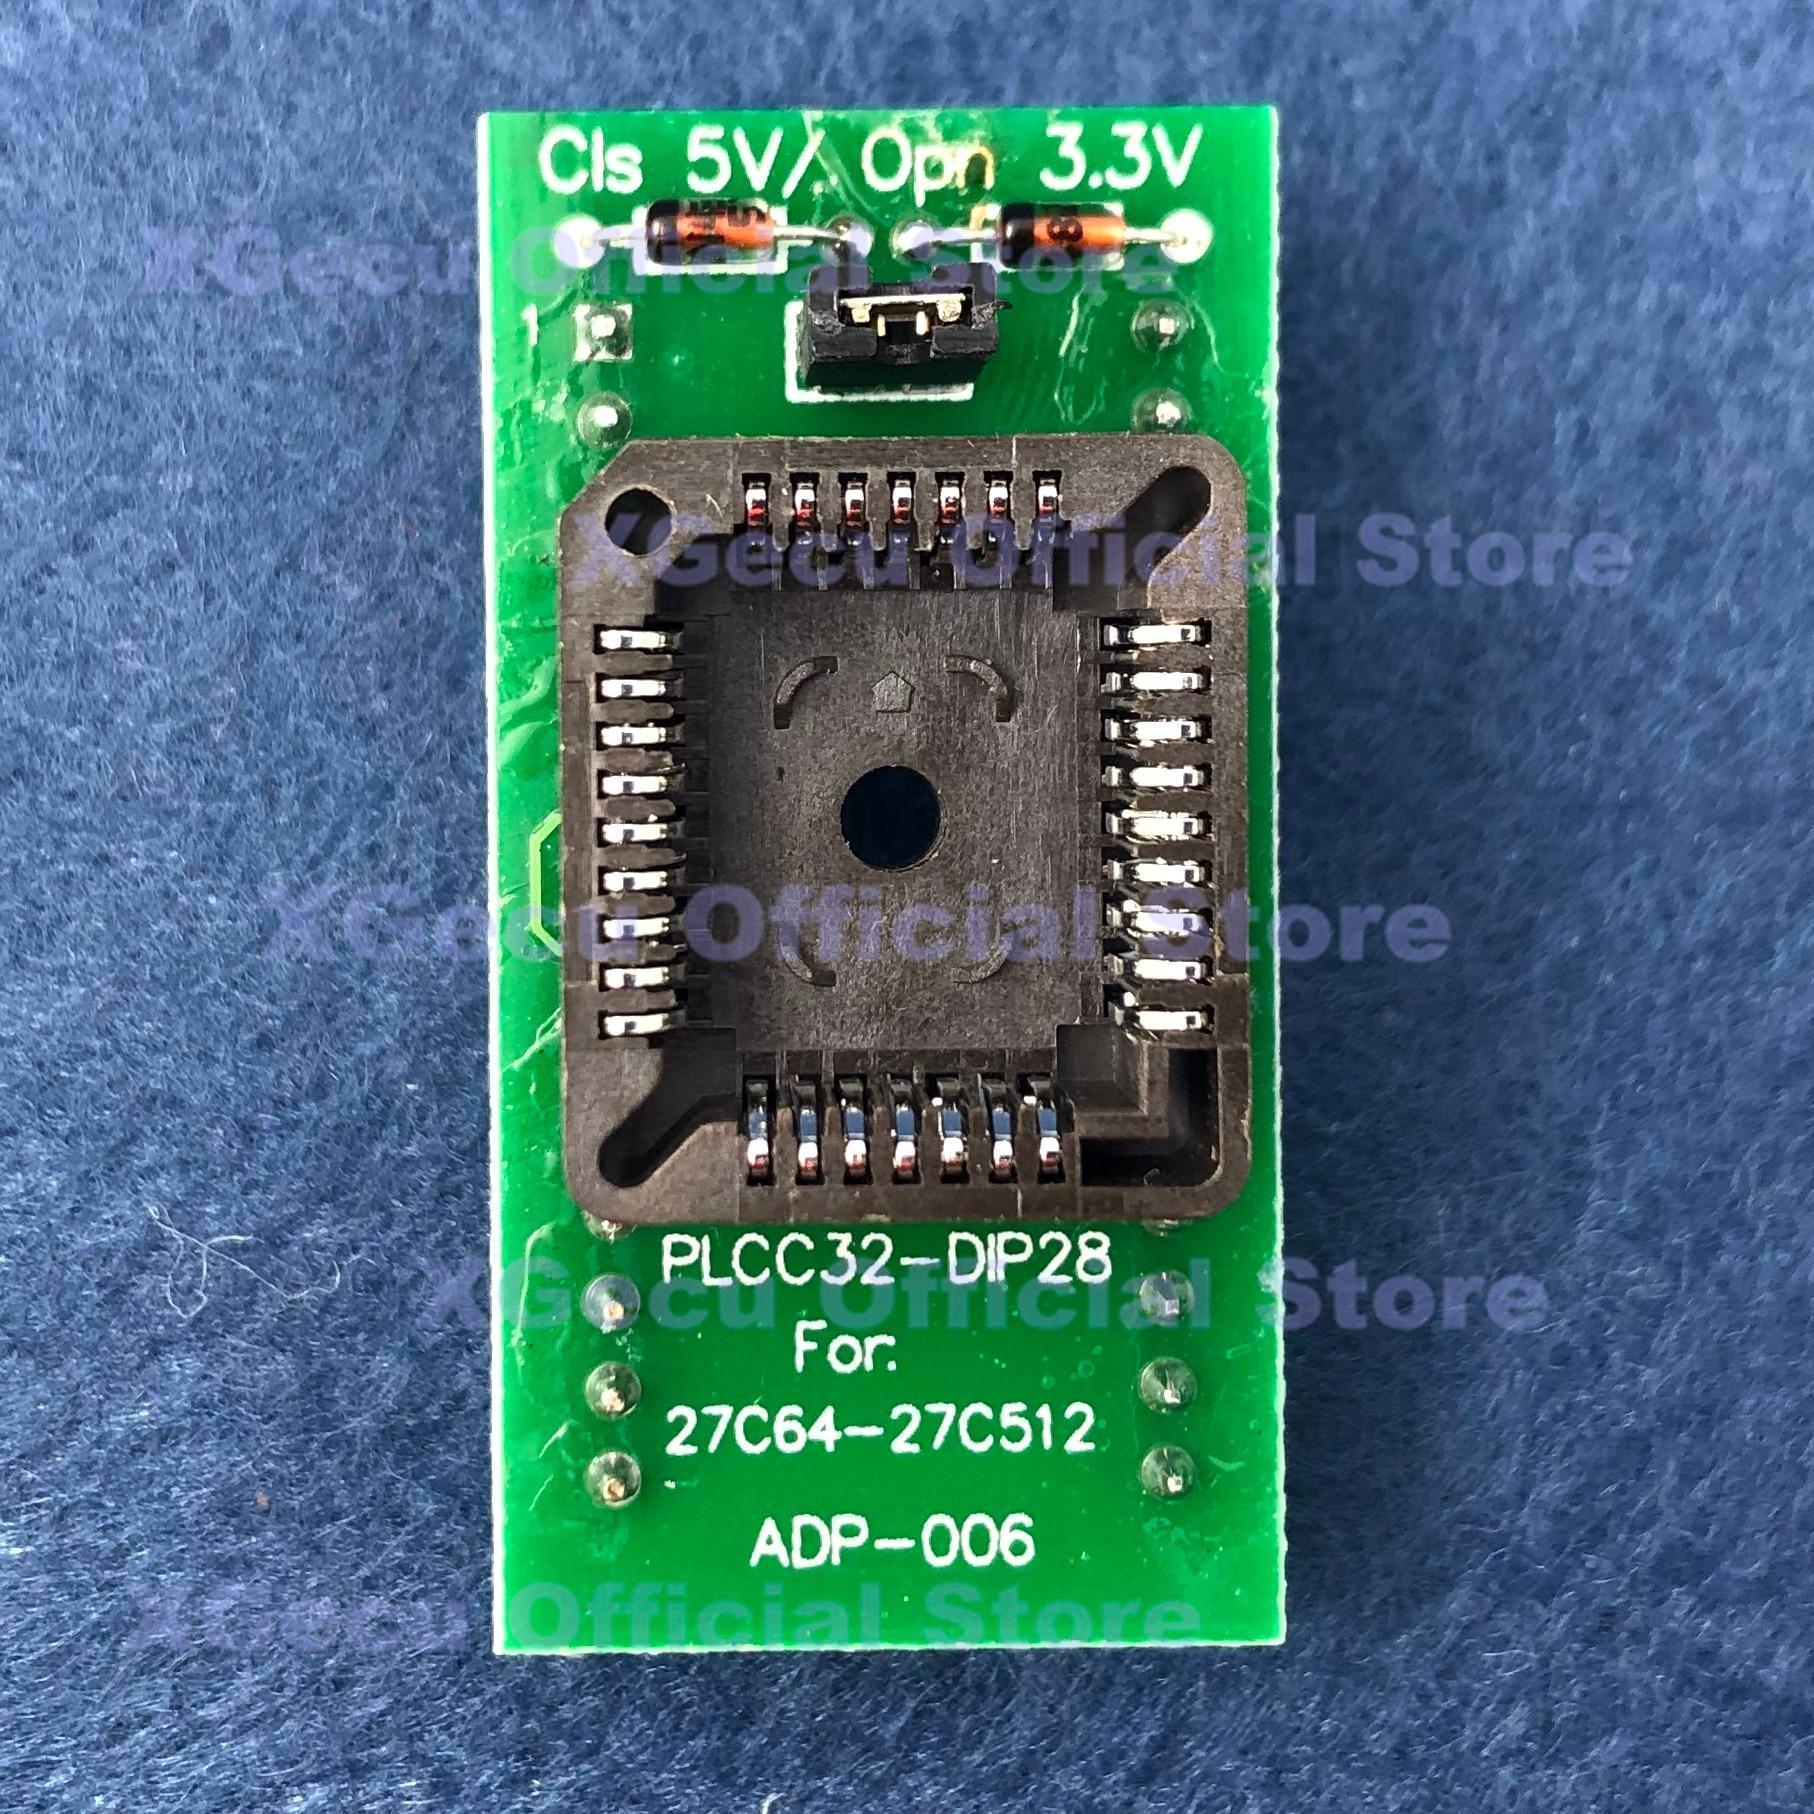 8pcs Test Adapter Kit Sop8 Sop16 PLCC44//32//28//20 DIP for TL866II Plus Programmer